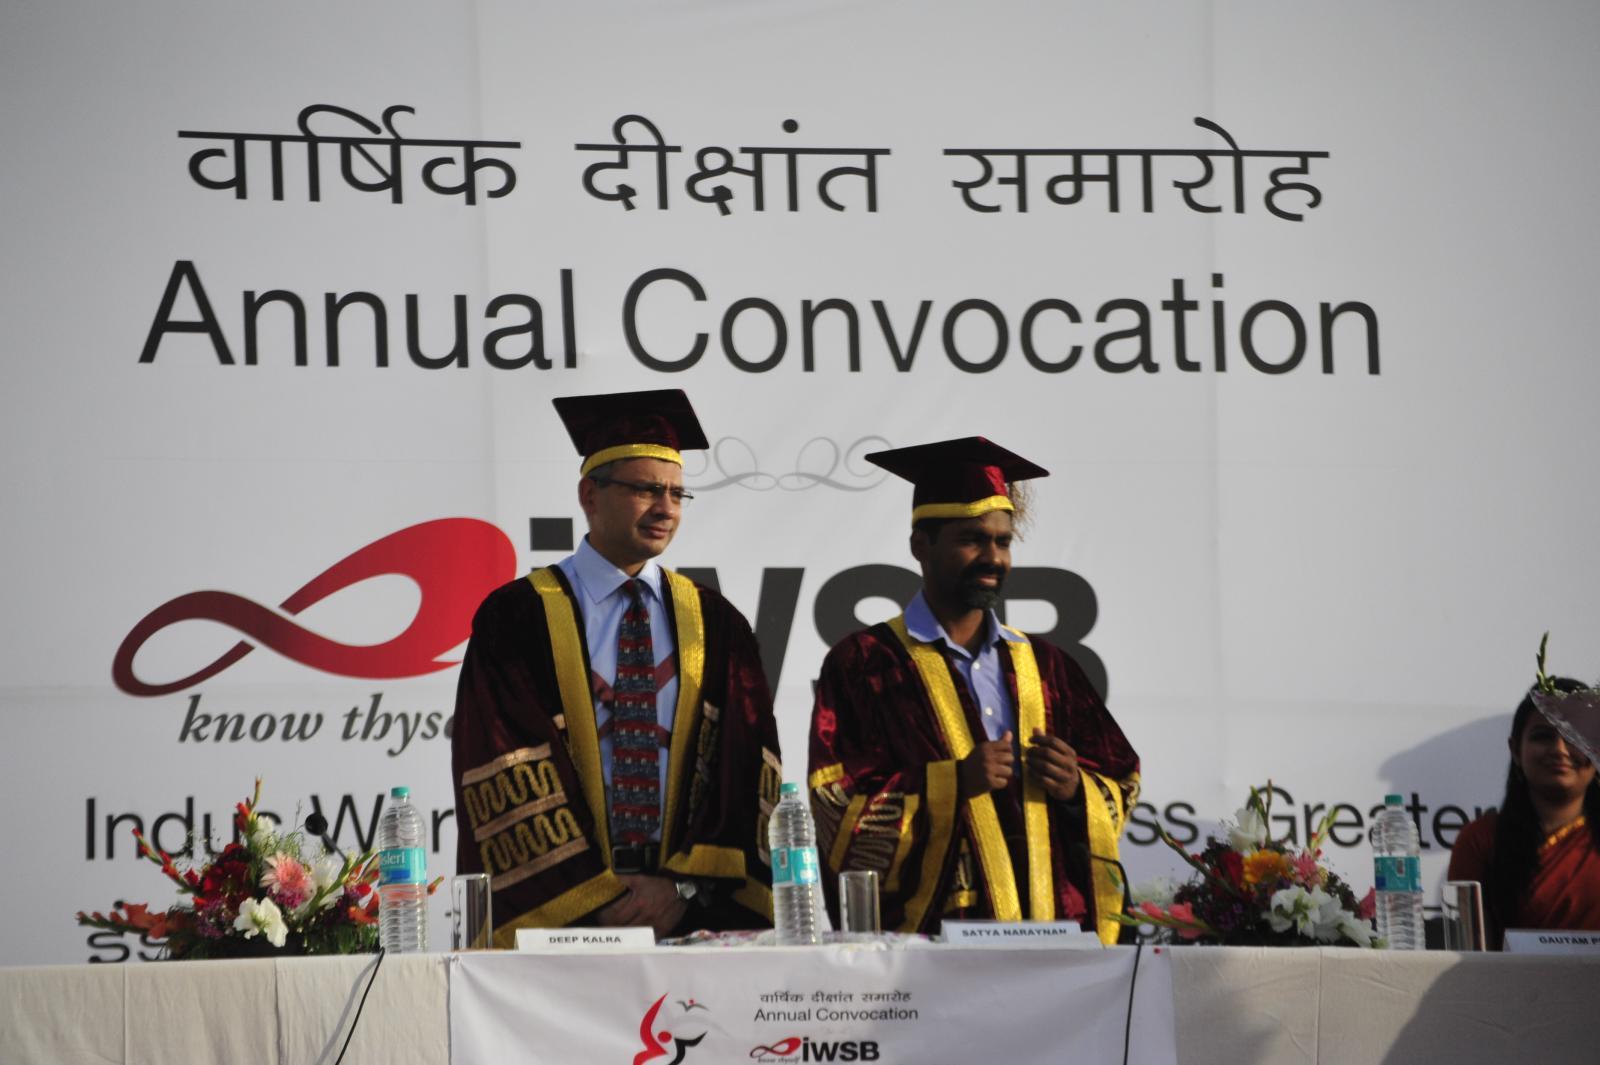 Deep Kalra, Founder MakeMyTrip.com; Satya, Chairman, BOG, IWSB at the 3rd convocation of IWSB